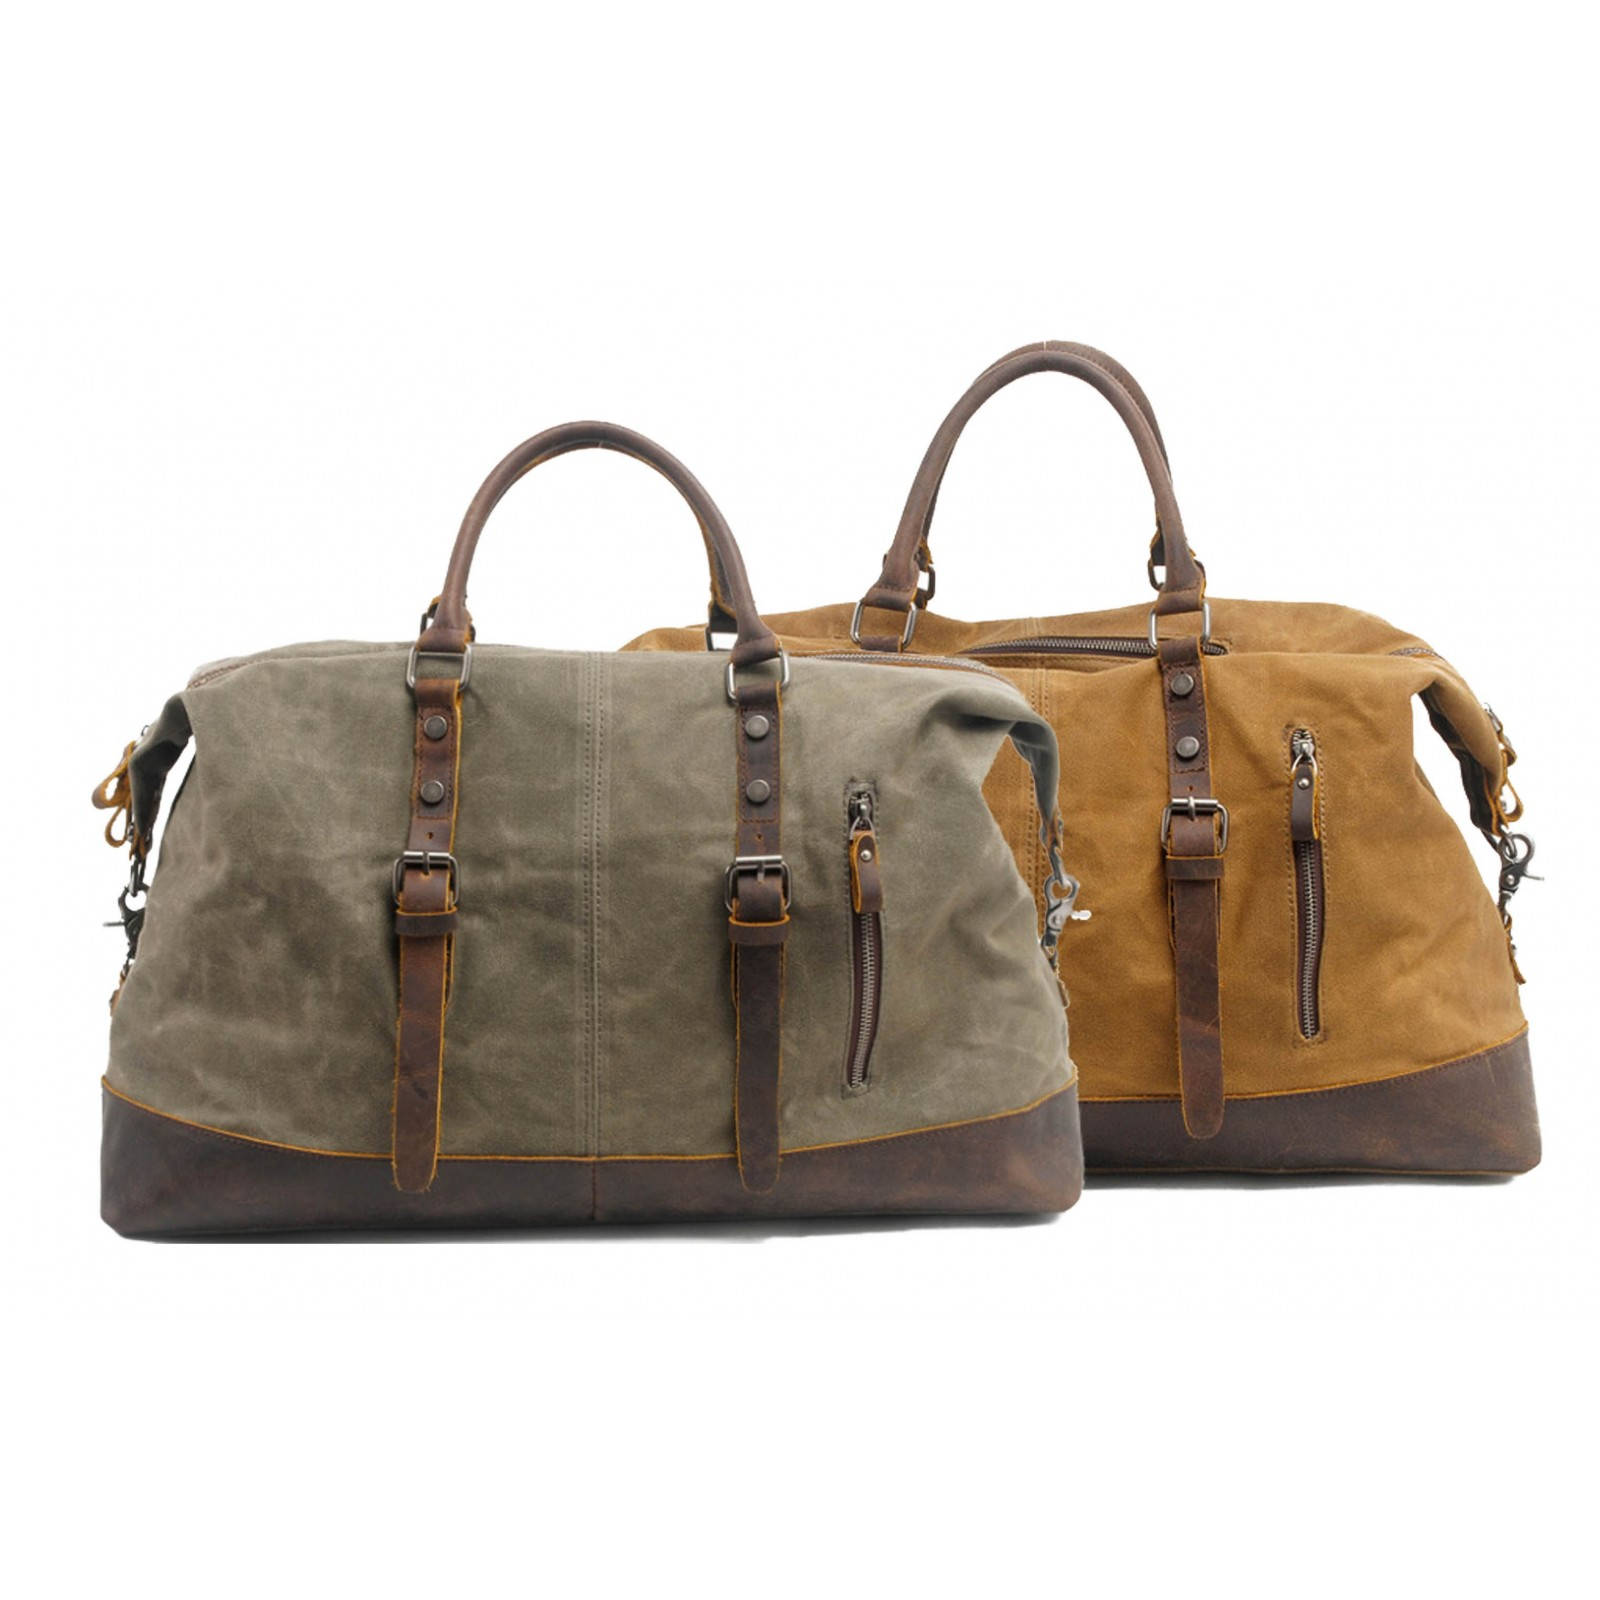 Kensington Duffel Bag